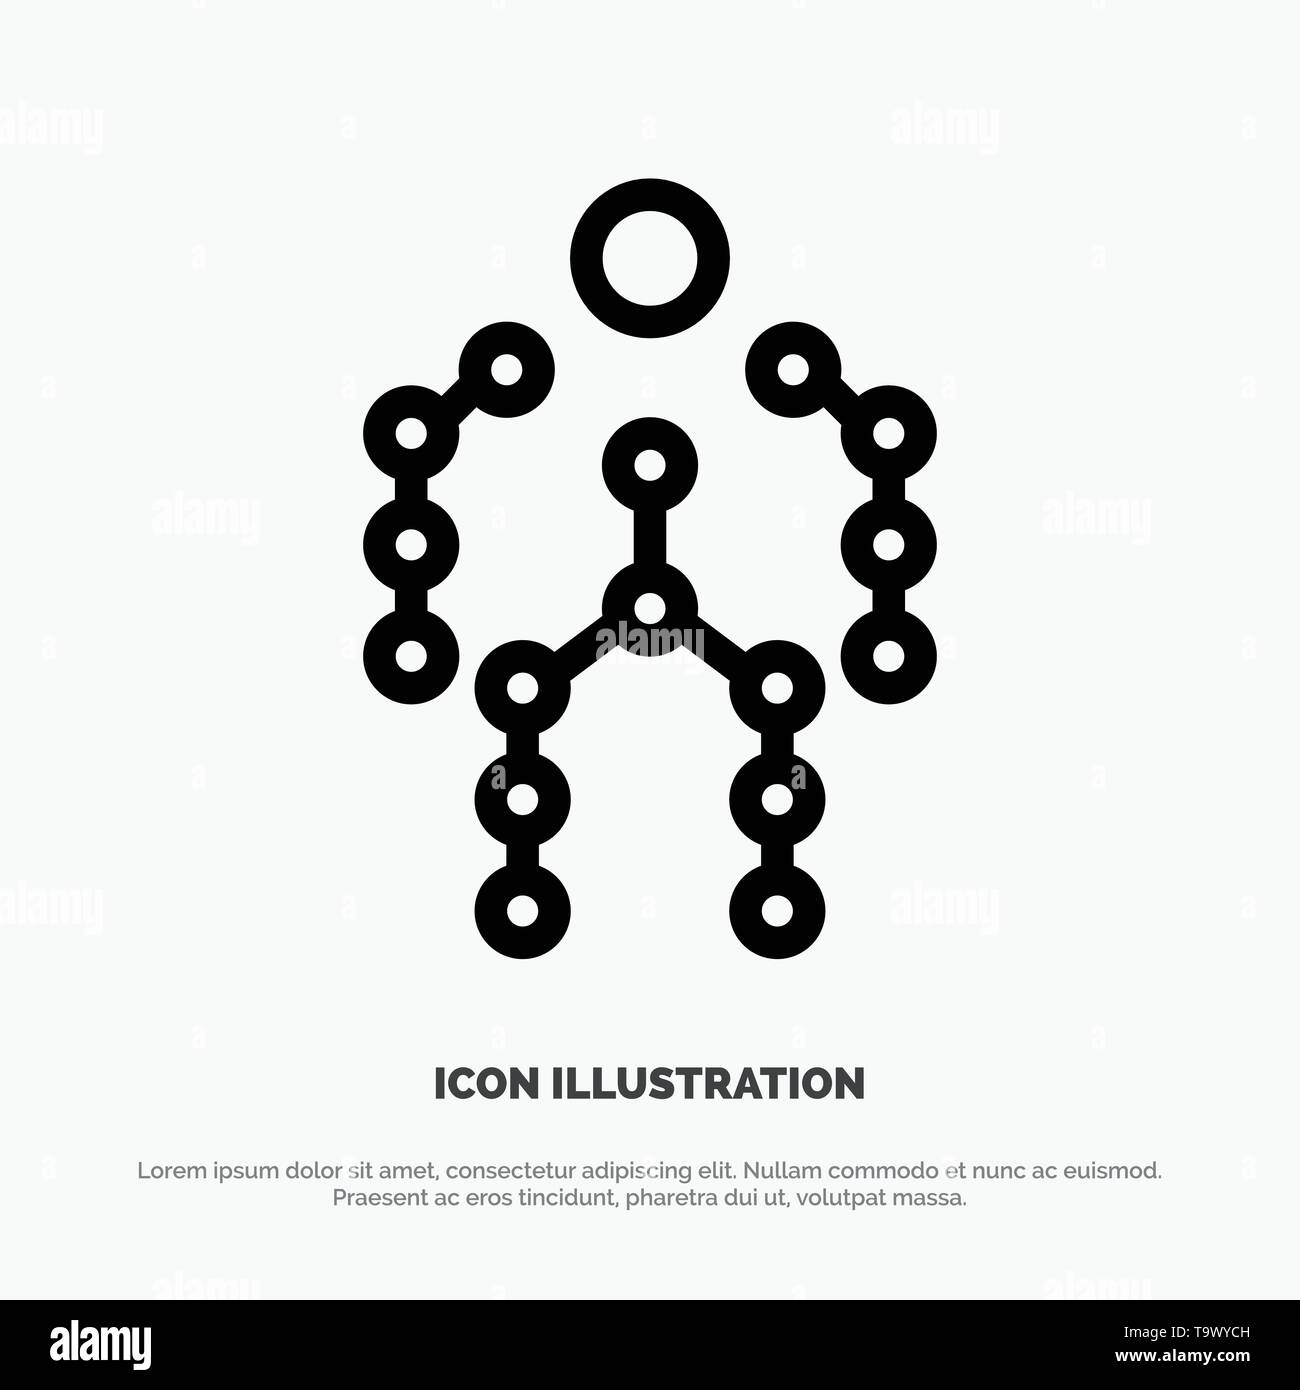 Action, Bones, Capture, Human, Motion Line Icon Vector - Stock Image